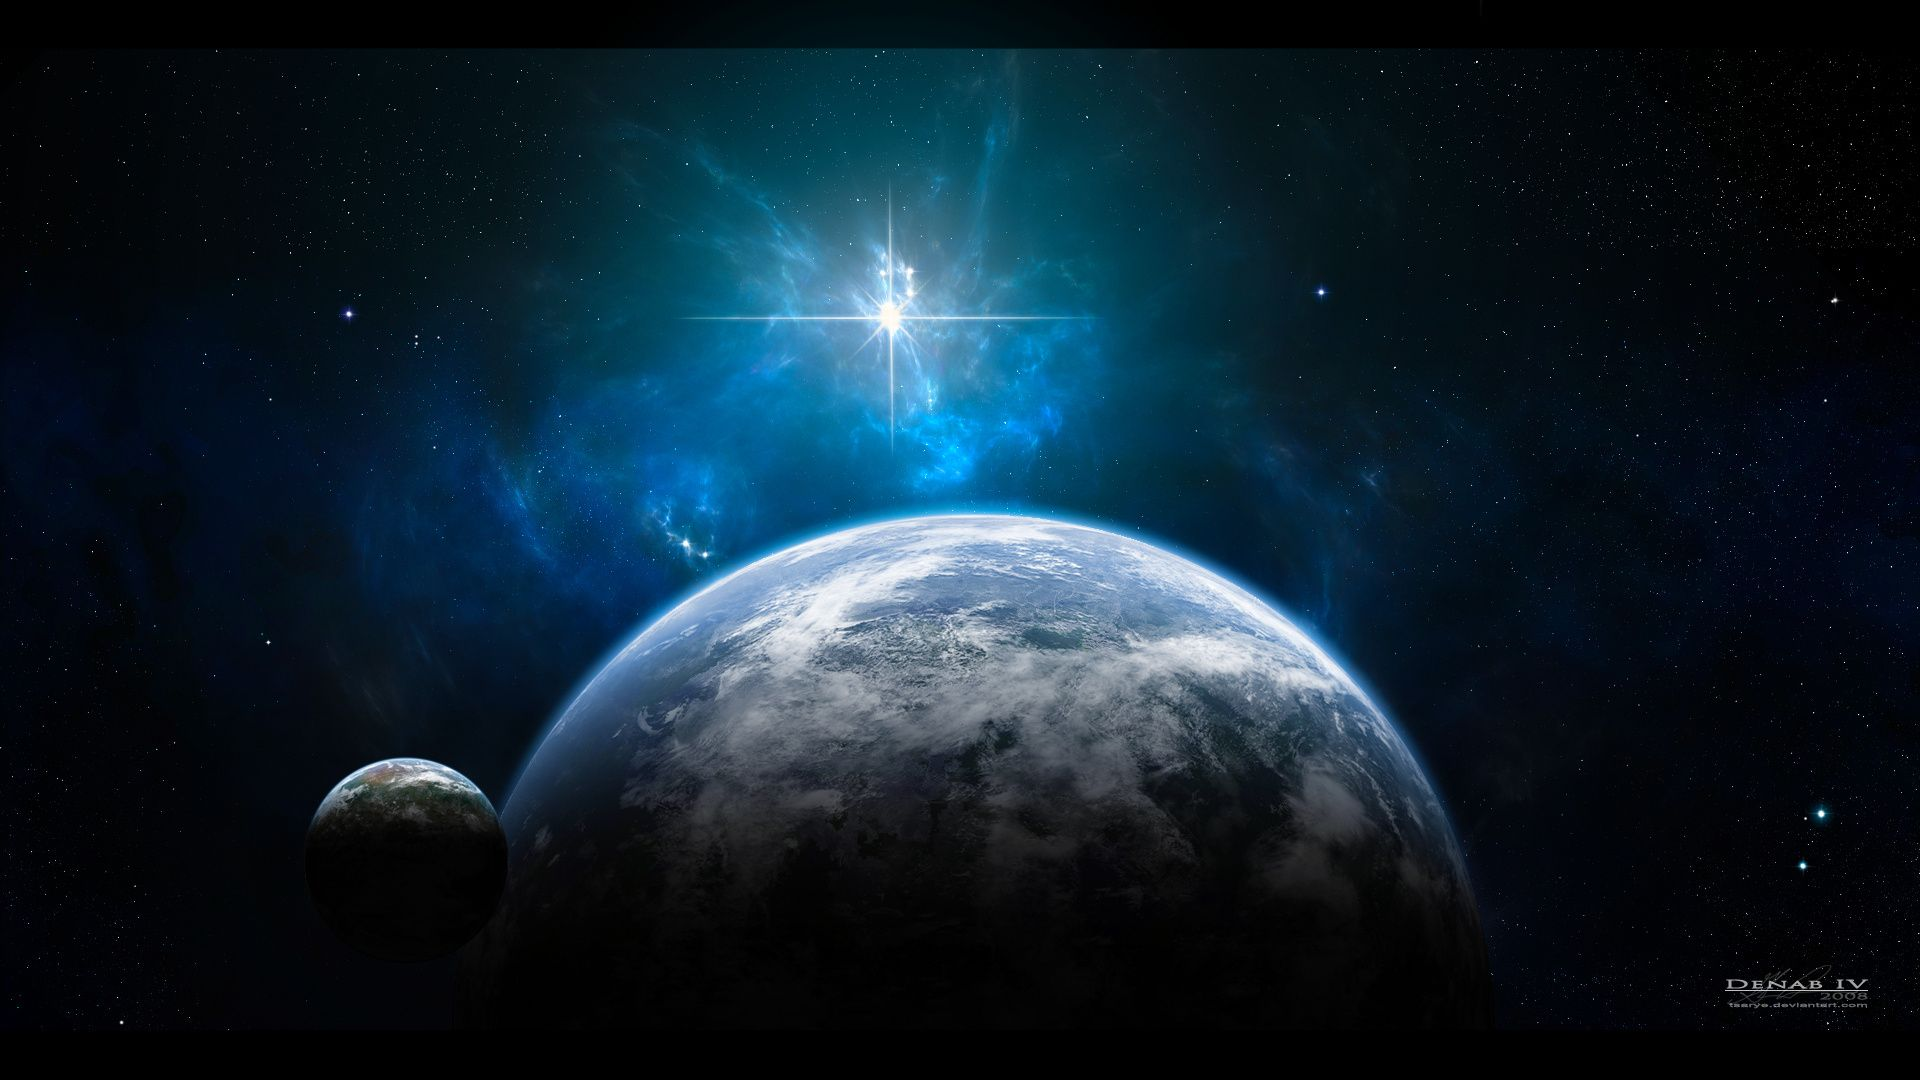 Earth from Space Wallpaper 1920x1080 - WallpaperSafari